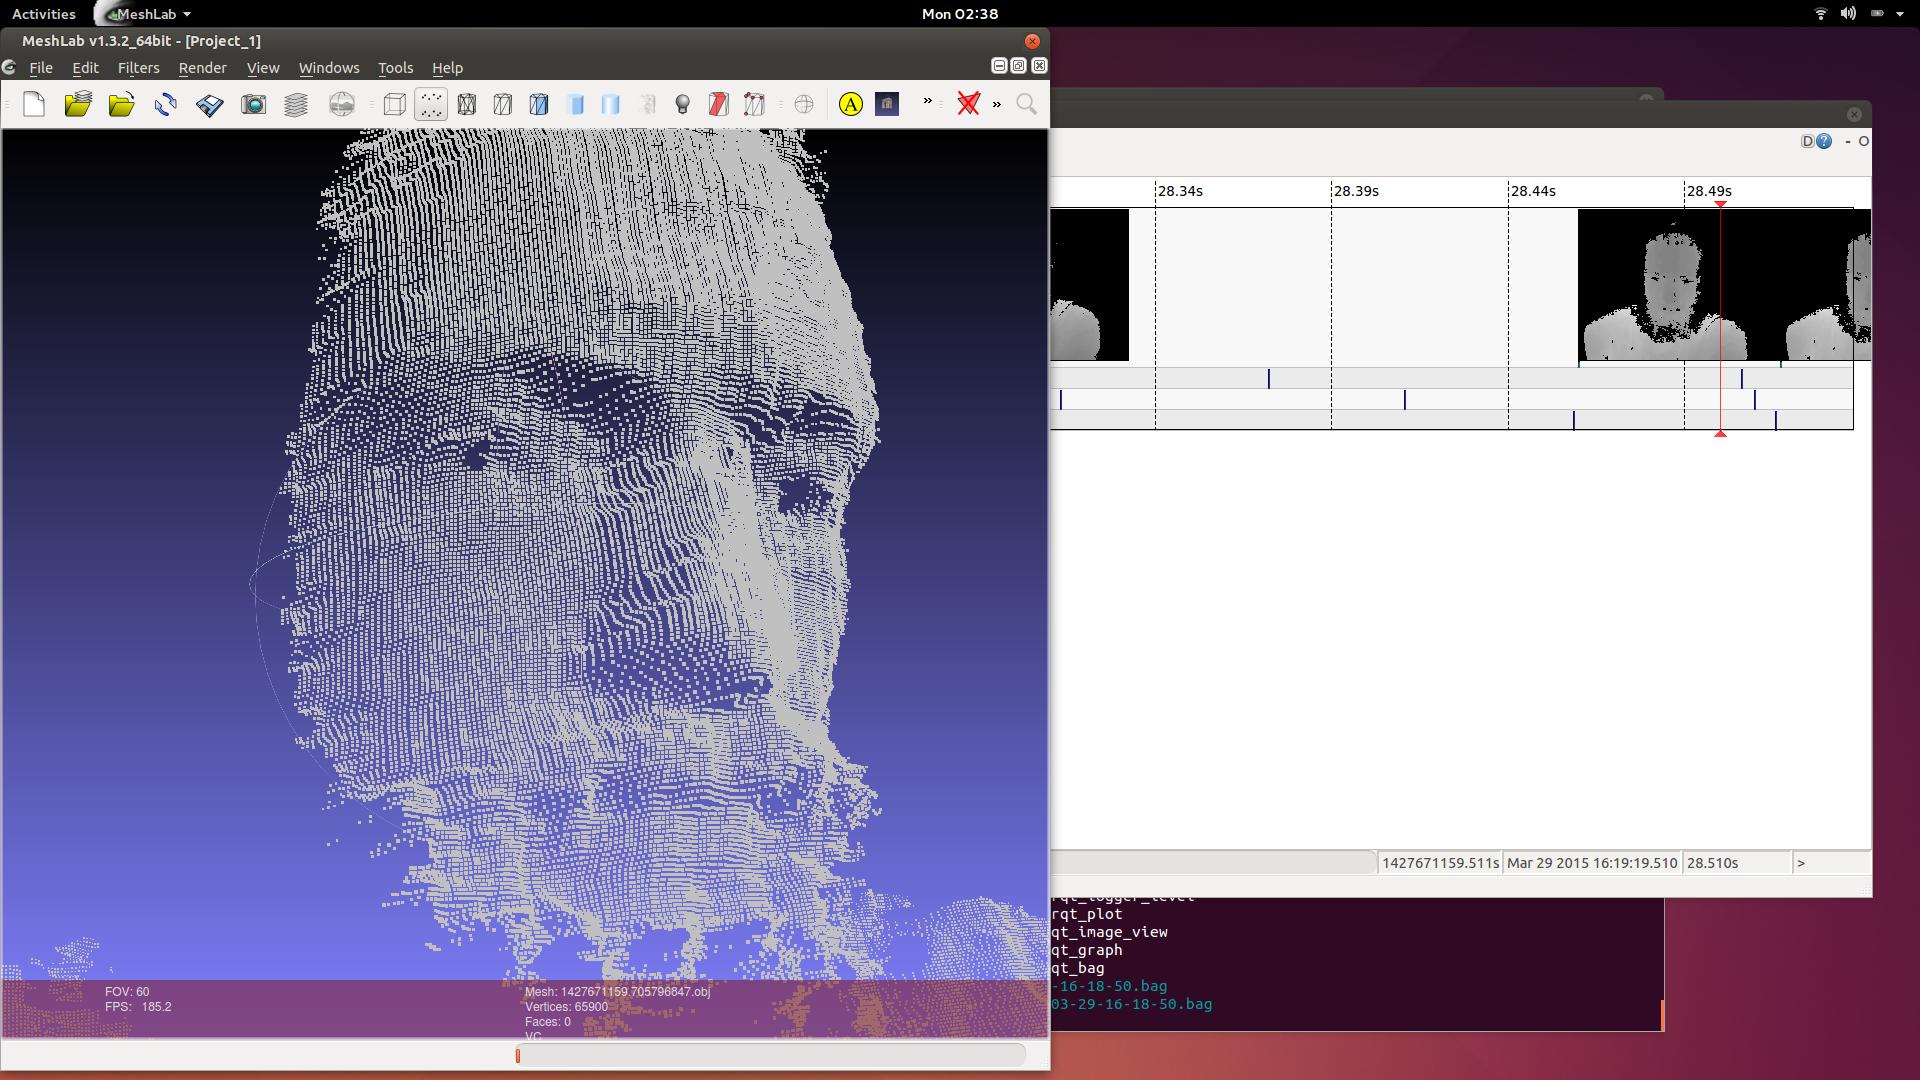 RealSense 3d camera on Linux Mac OS X  infrared, calibration